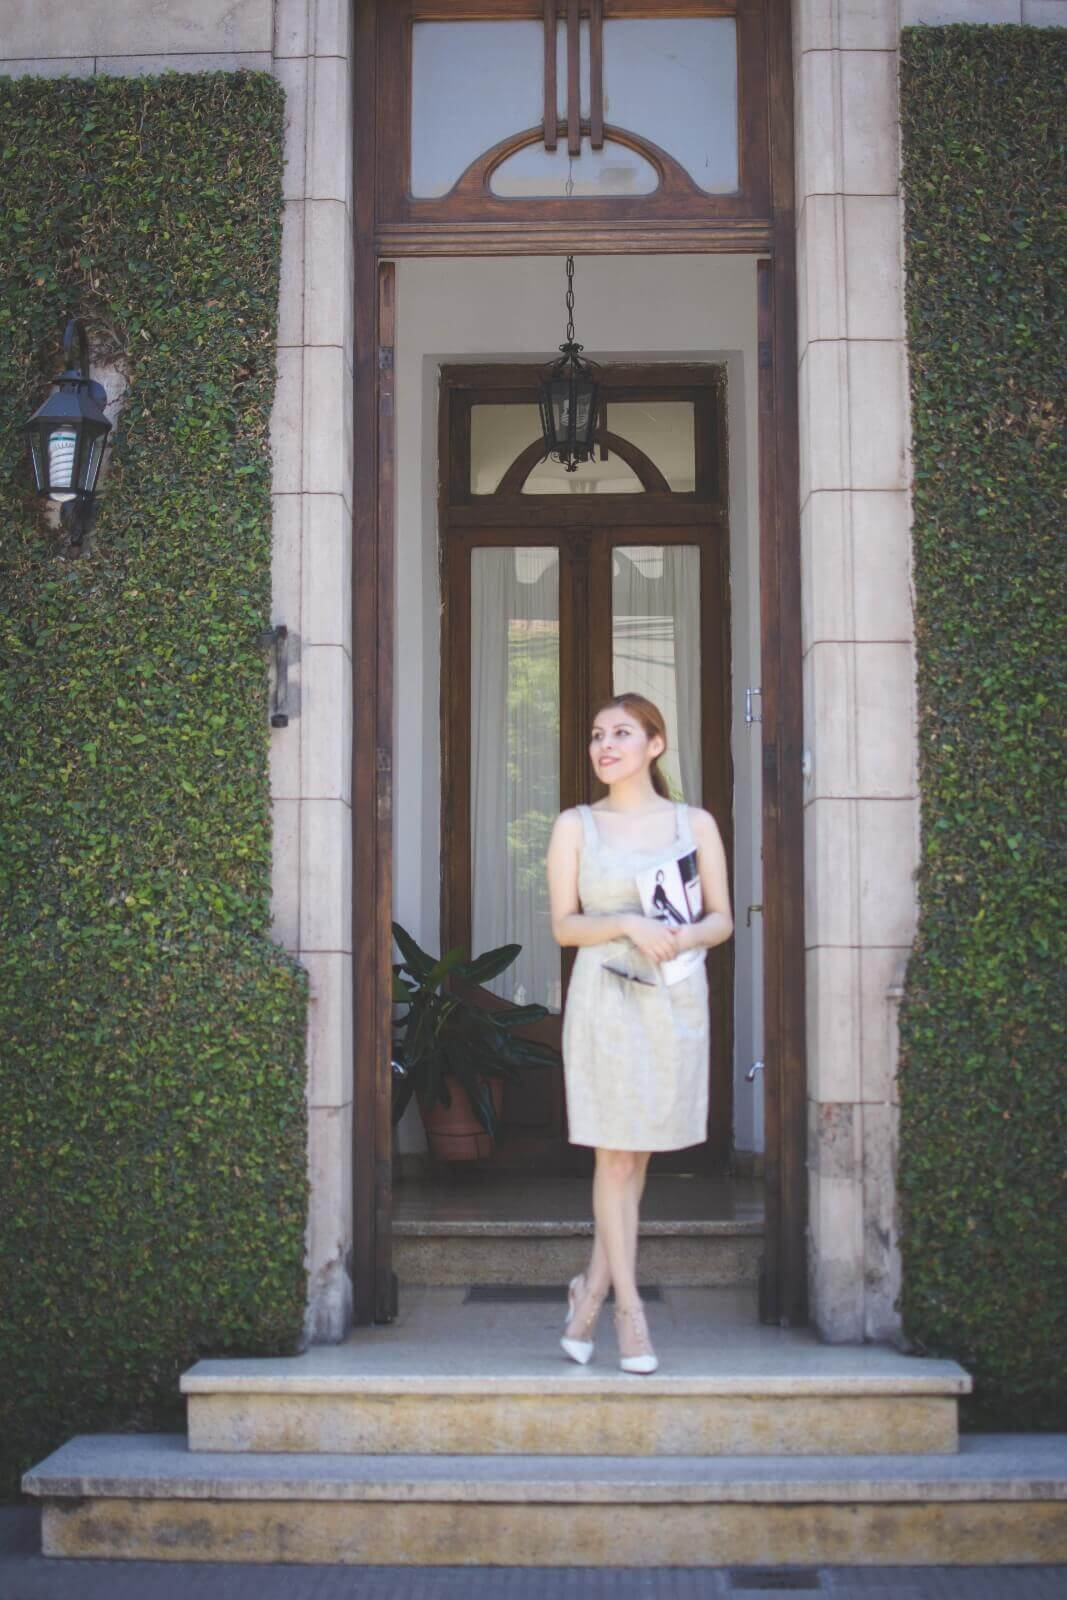 almond-white-dress-sammydress-stilettos-valentino-rockstud-imitation-deborah-ferrero-style-by-deb-ladylike05